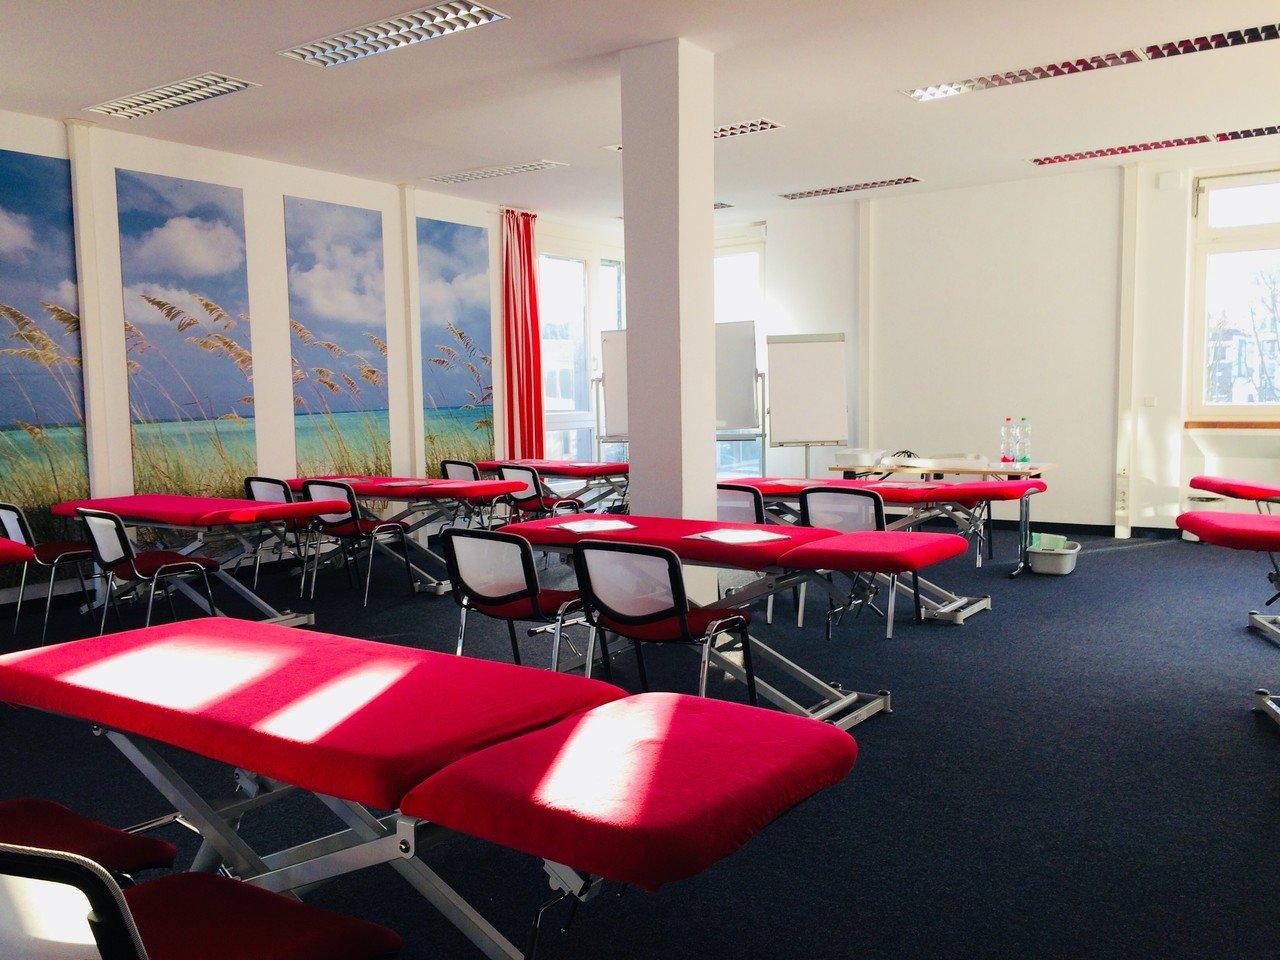 Berlin  Meetingraum Medizinisches Fortbildungszentrum image 2